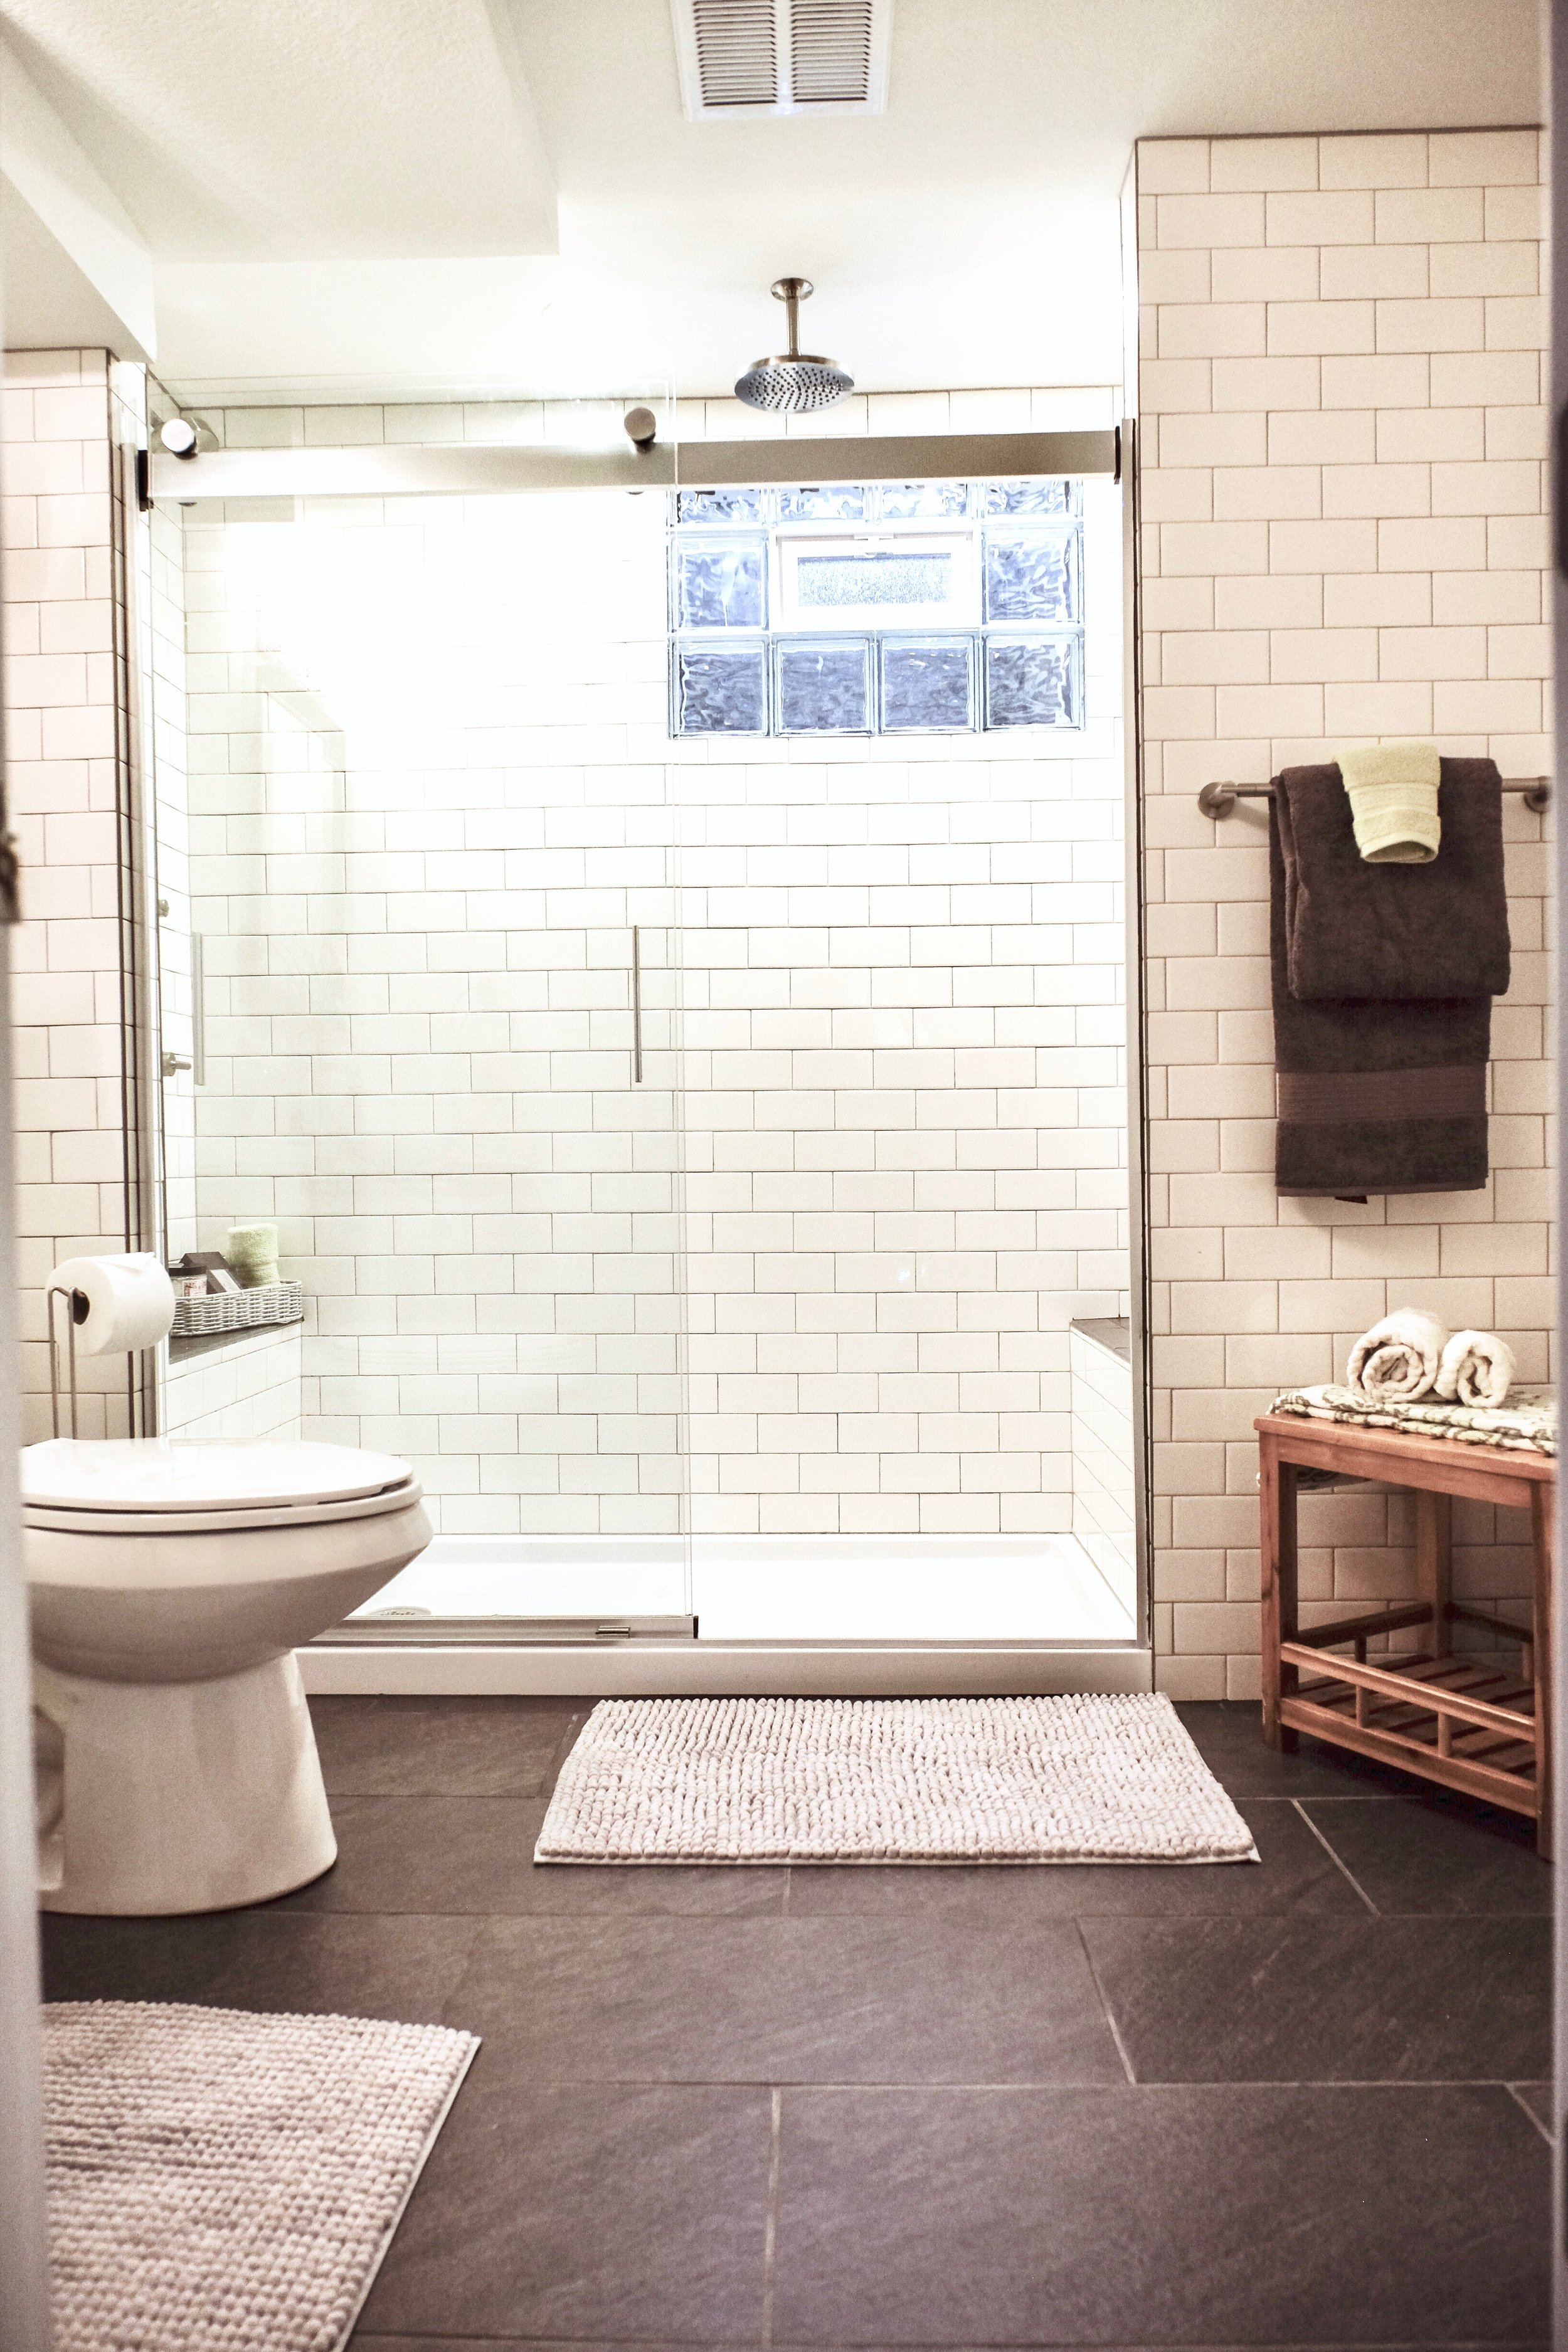 Porcelain tile floors create a durable surface for wet areas.